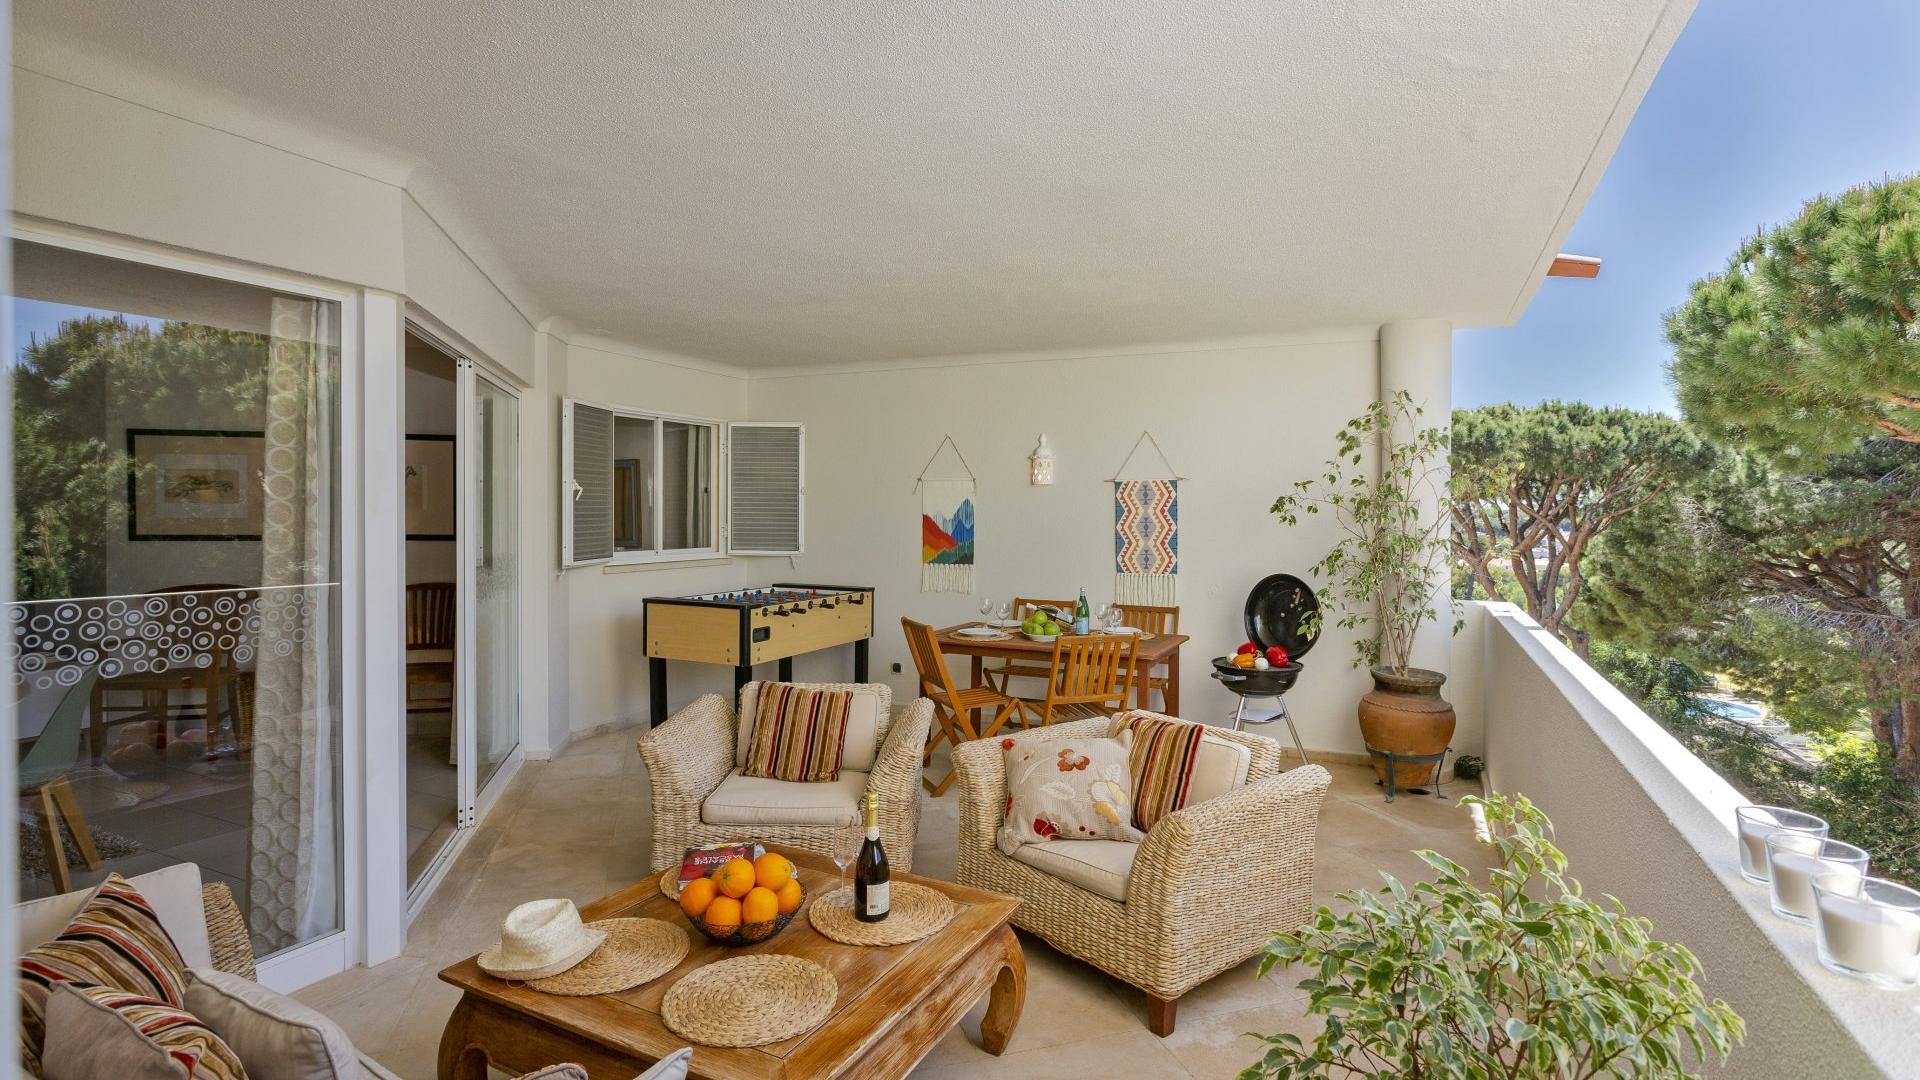 Apartment Primrose - Jardins do Golfe, Vale do Lobo, Algarve - _O5A4724.jpg